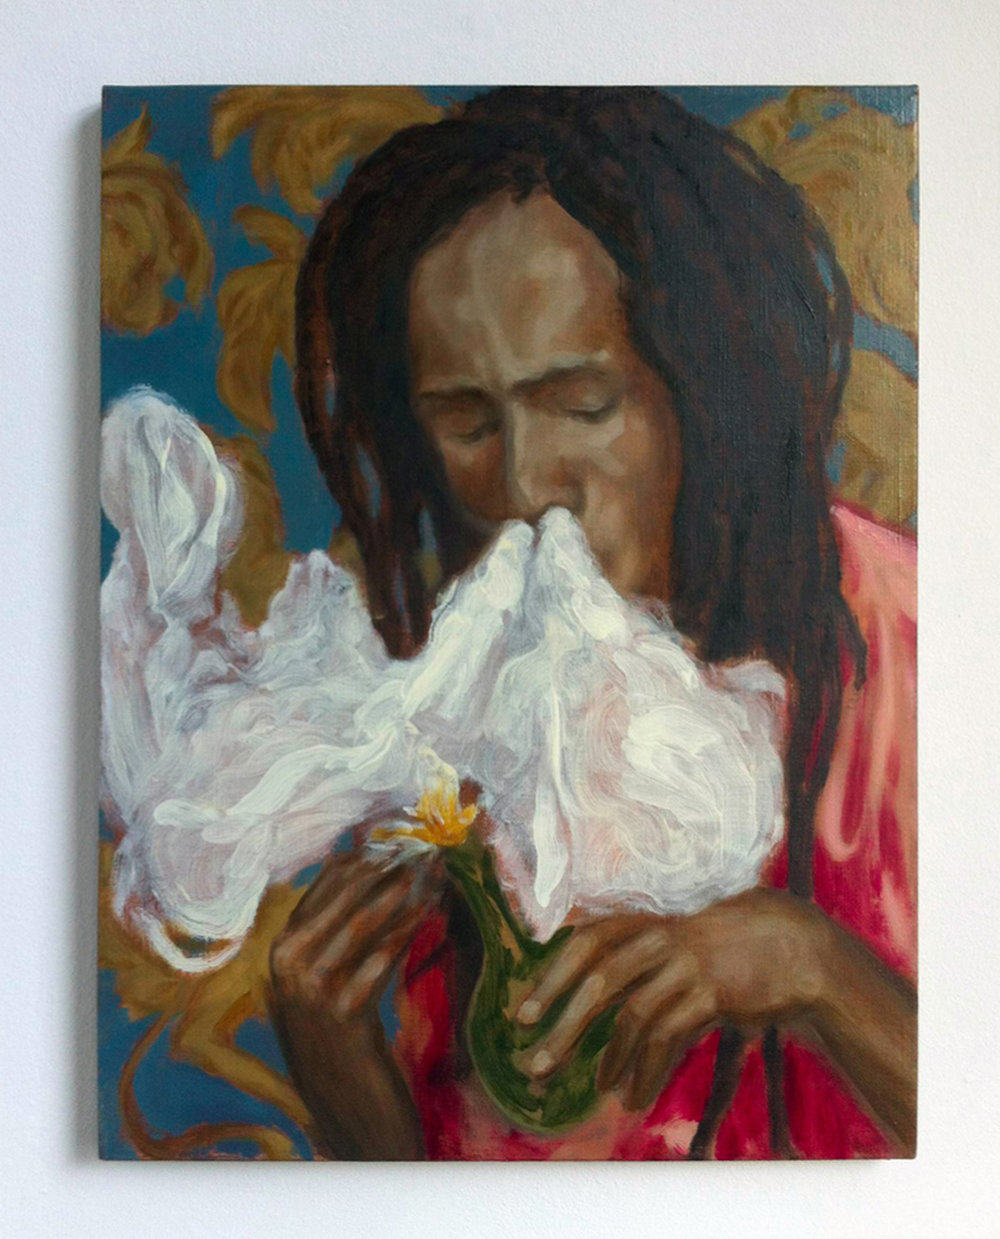 Rococo rasta,  2015 Oil on canvas, 60 x 45 cm